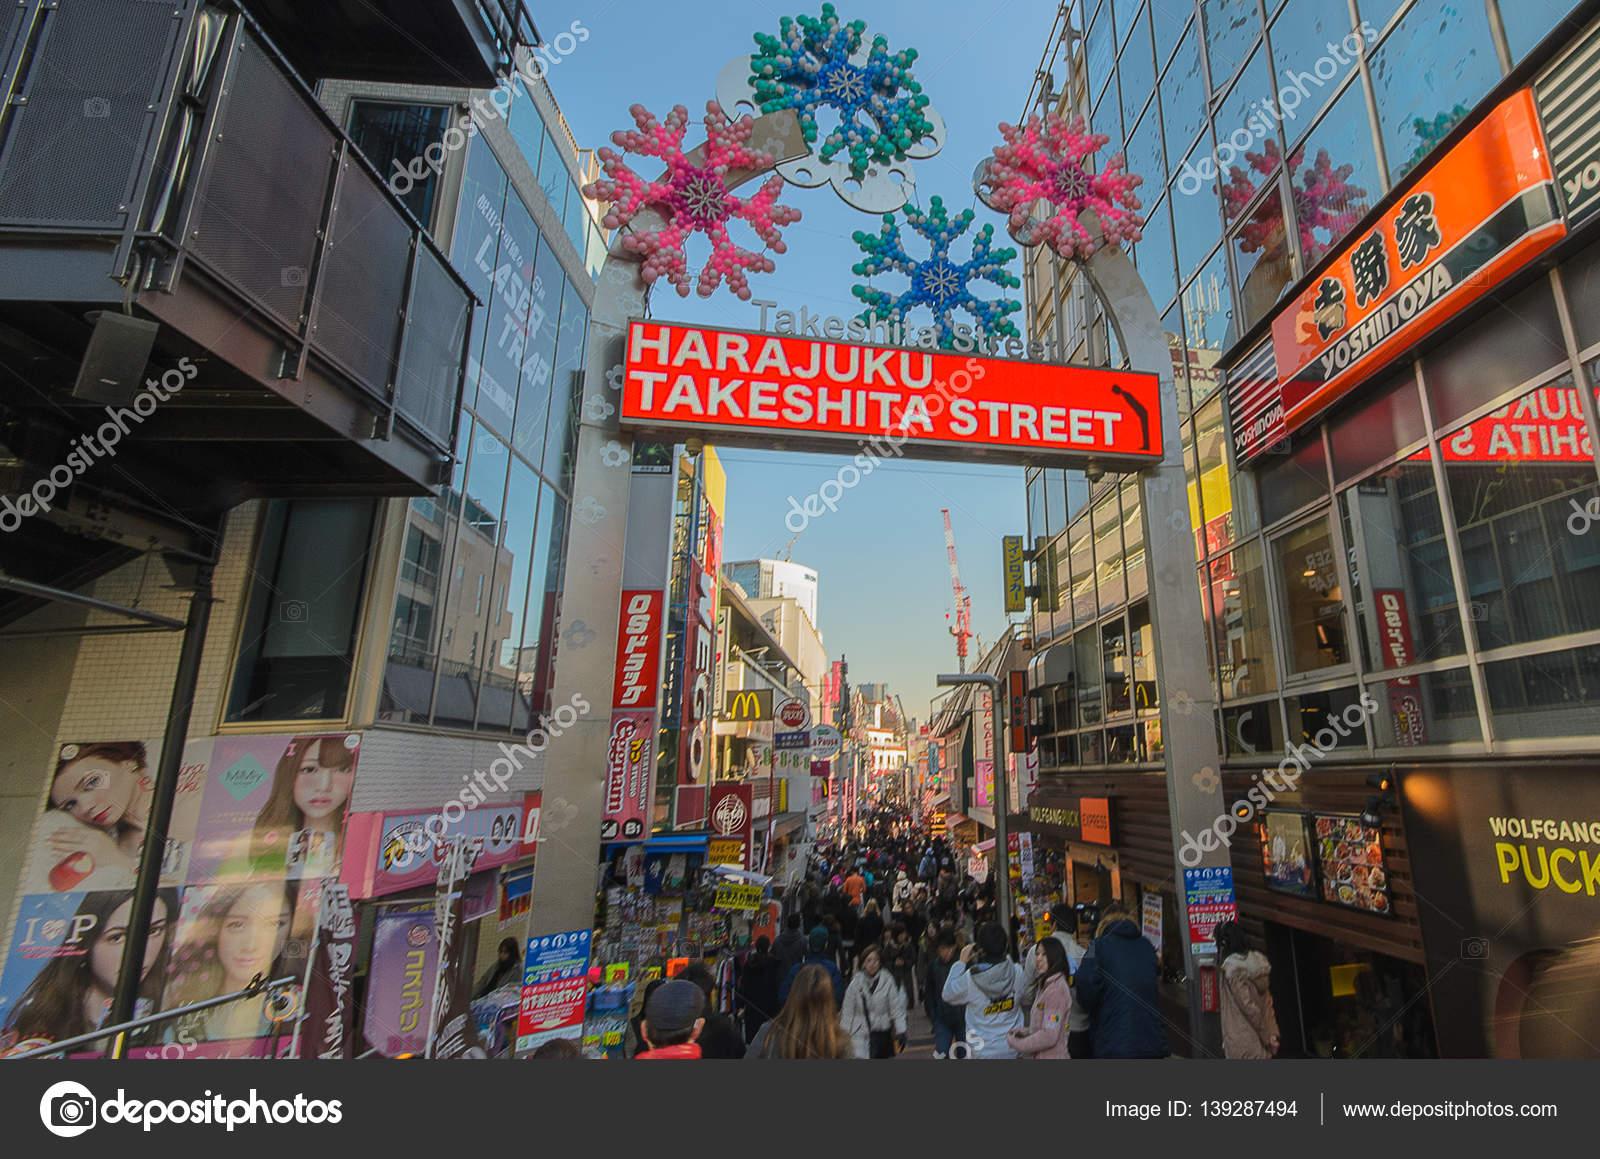 Harajuku Fashion Shopping Prices